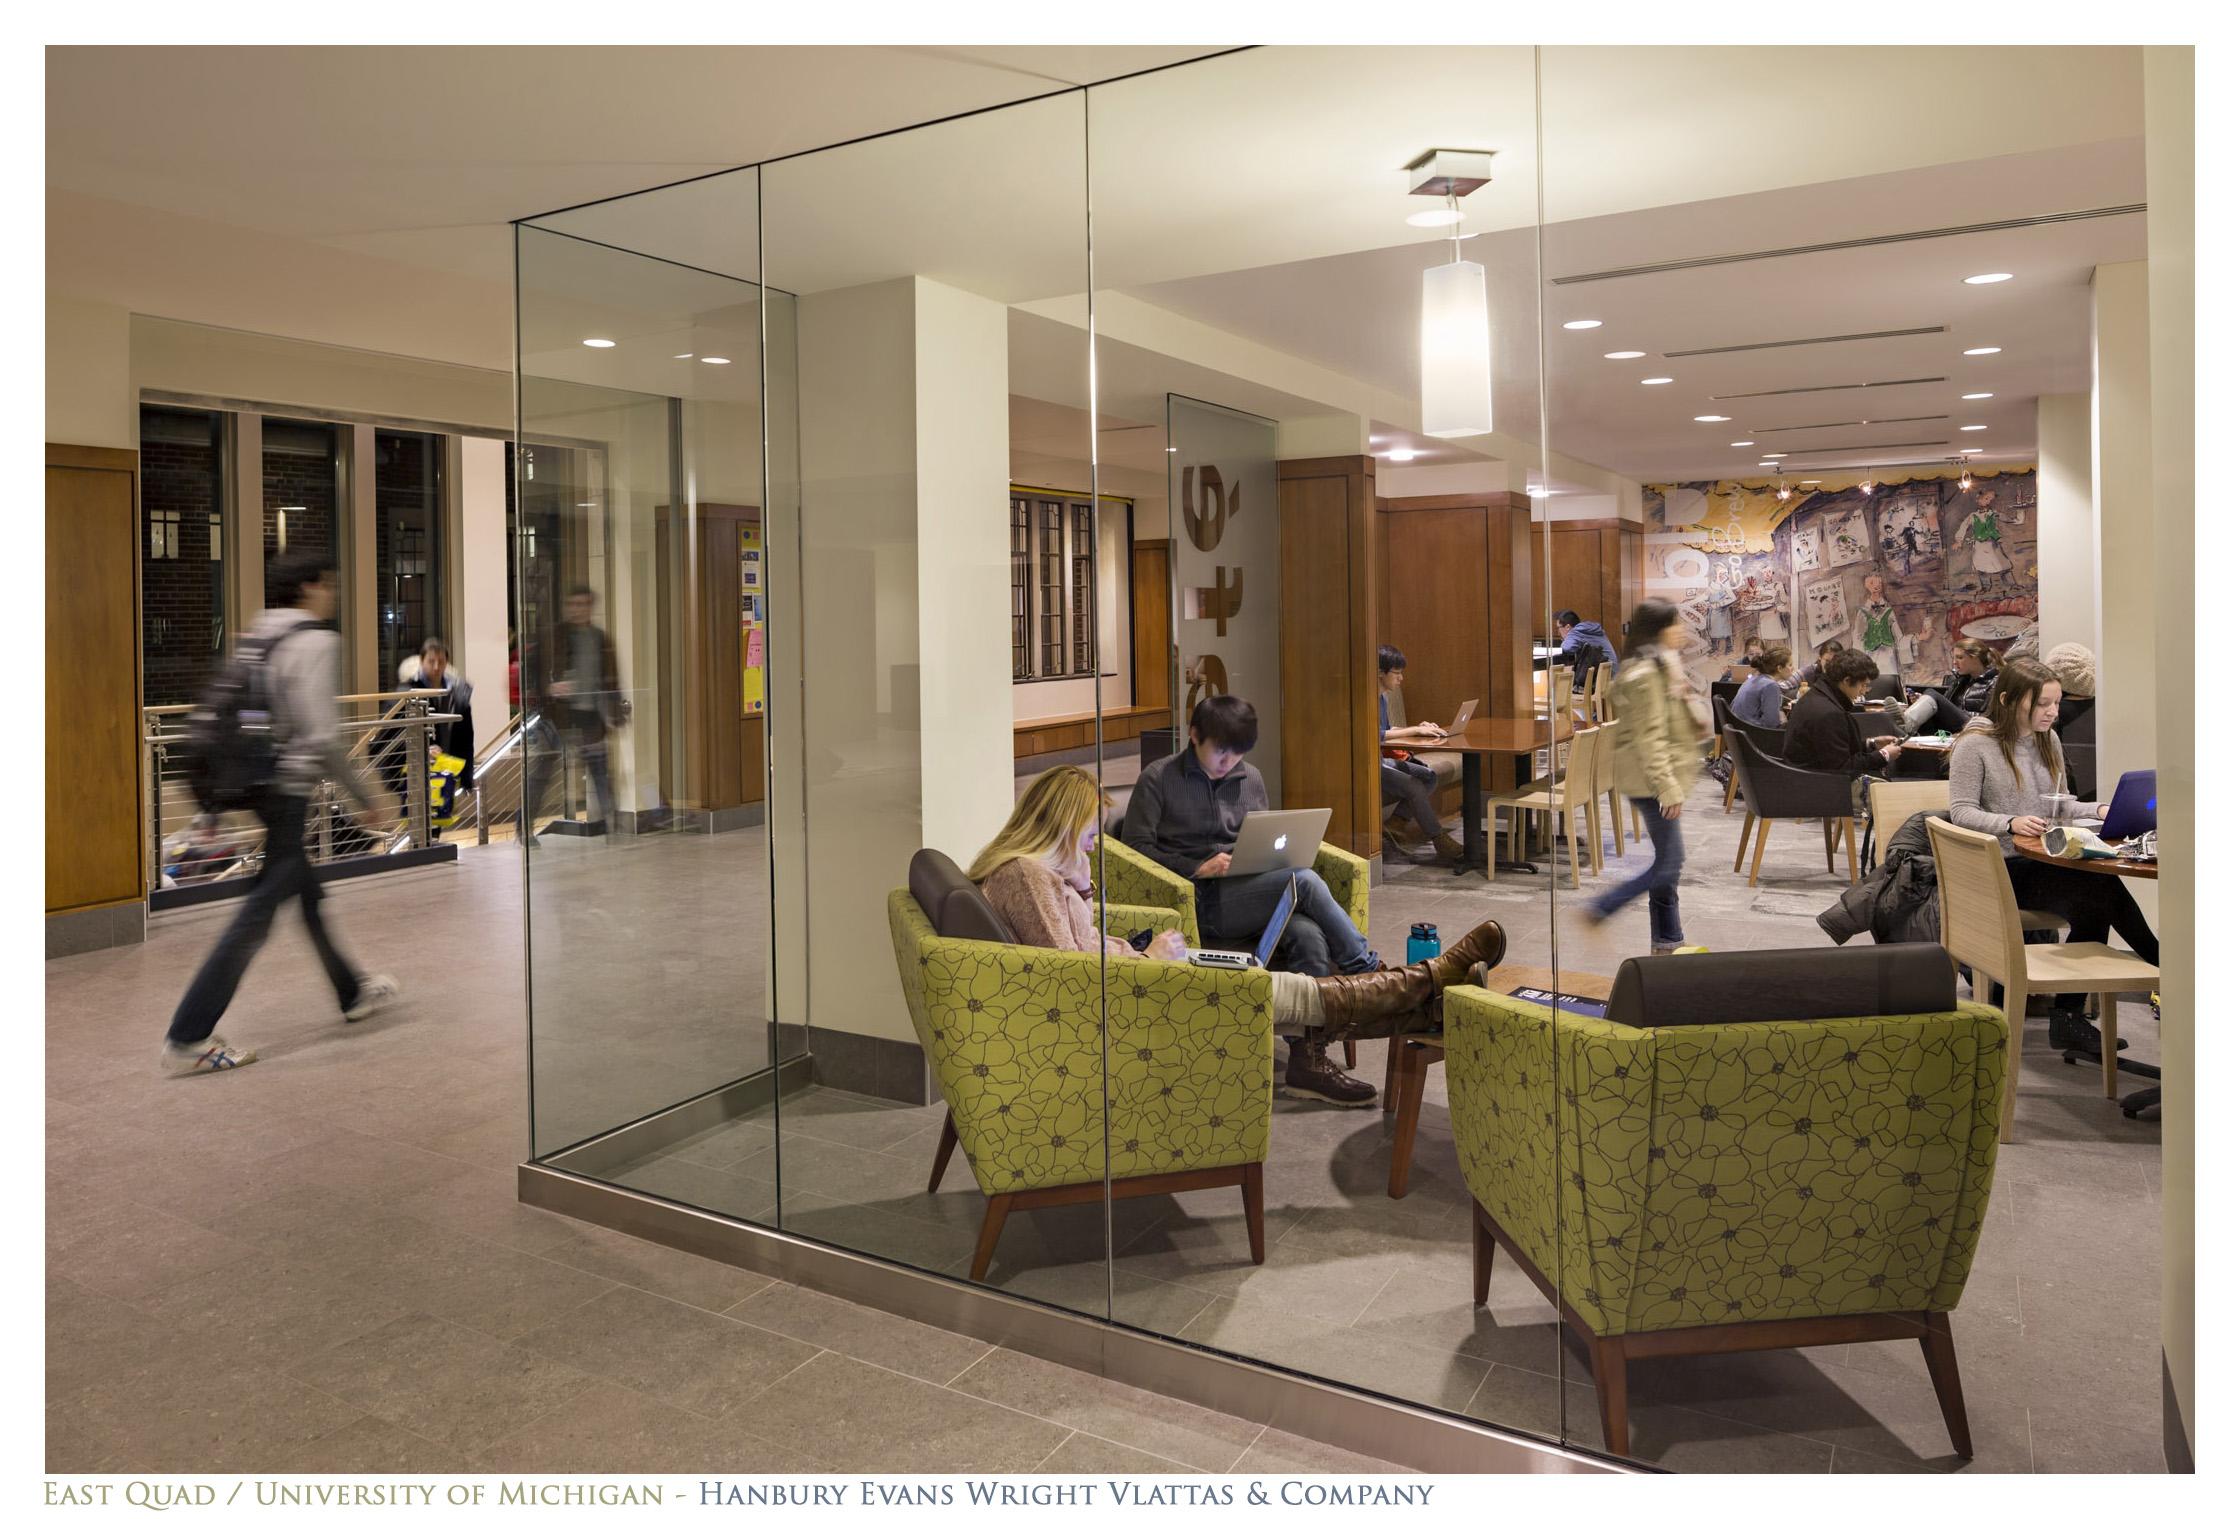 033_Robert-Benson-Photography-Hanbury-Evans-Wright-Vlattas-University-Michigan-East-Quad-Student-Housing-Architectural-Photography-10.JPG